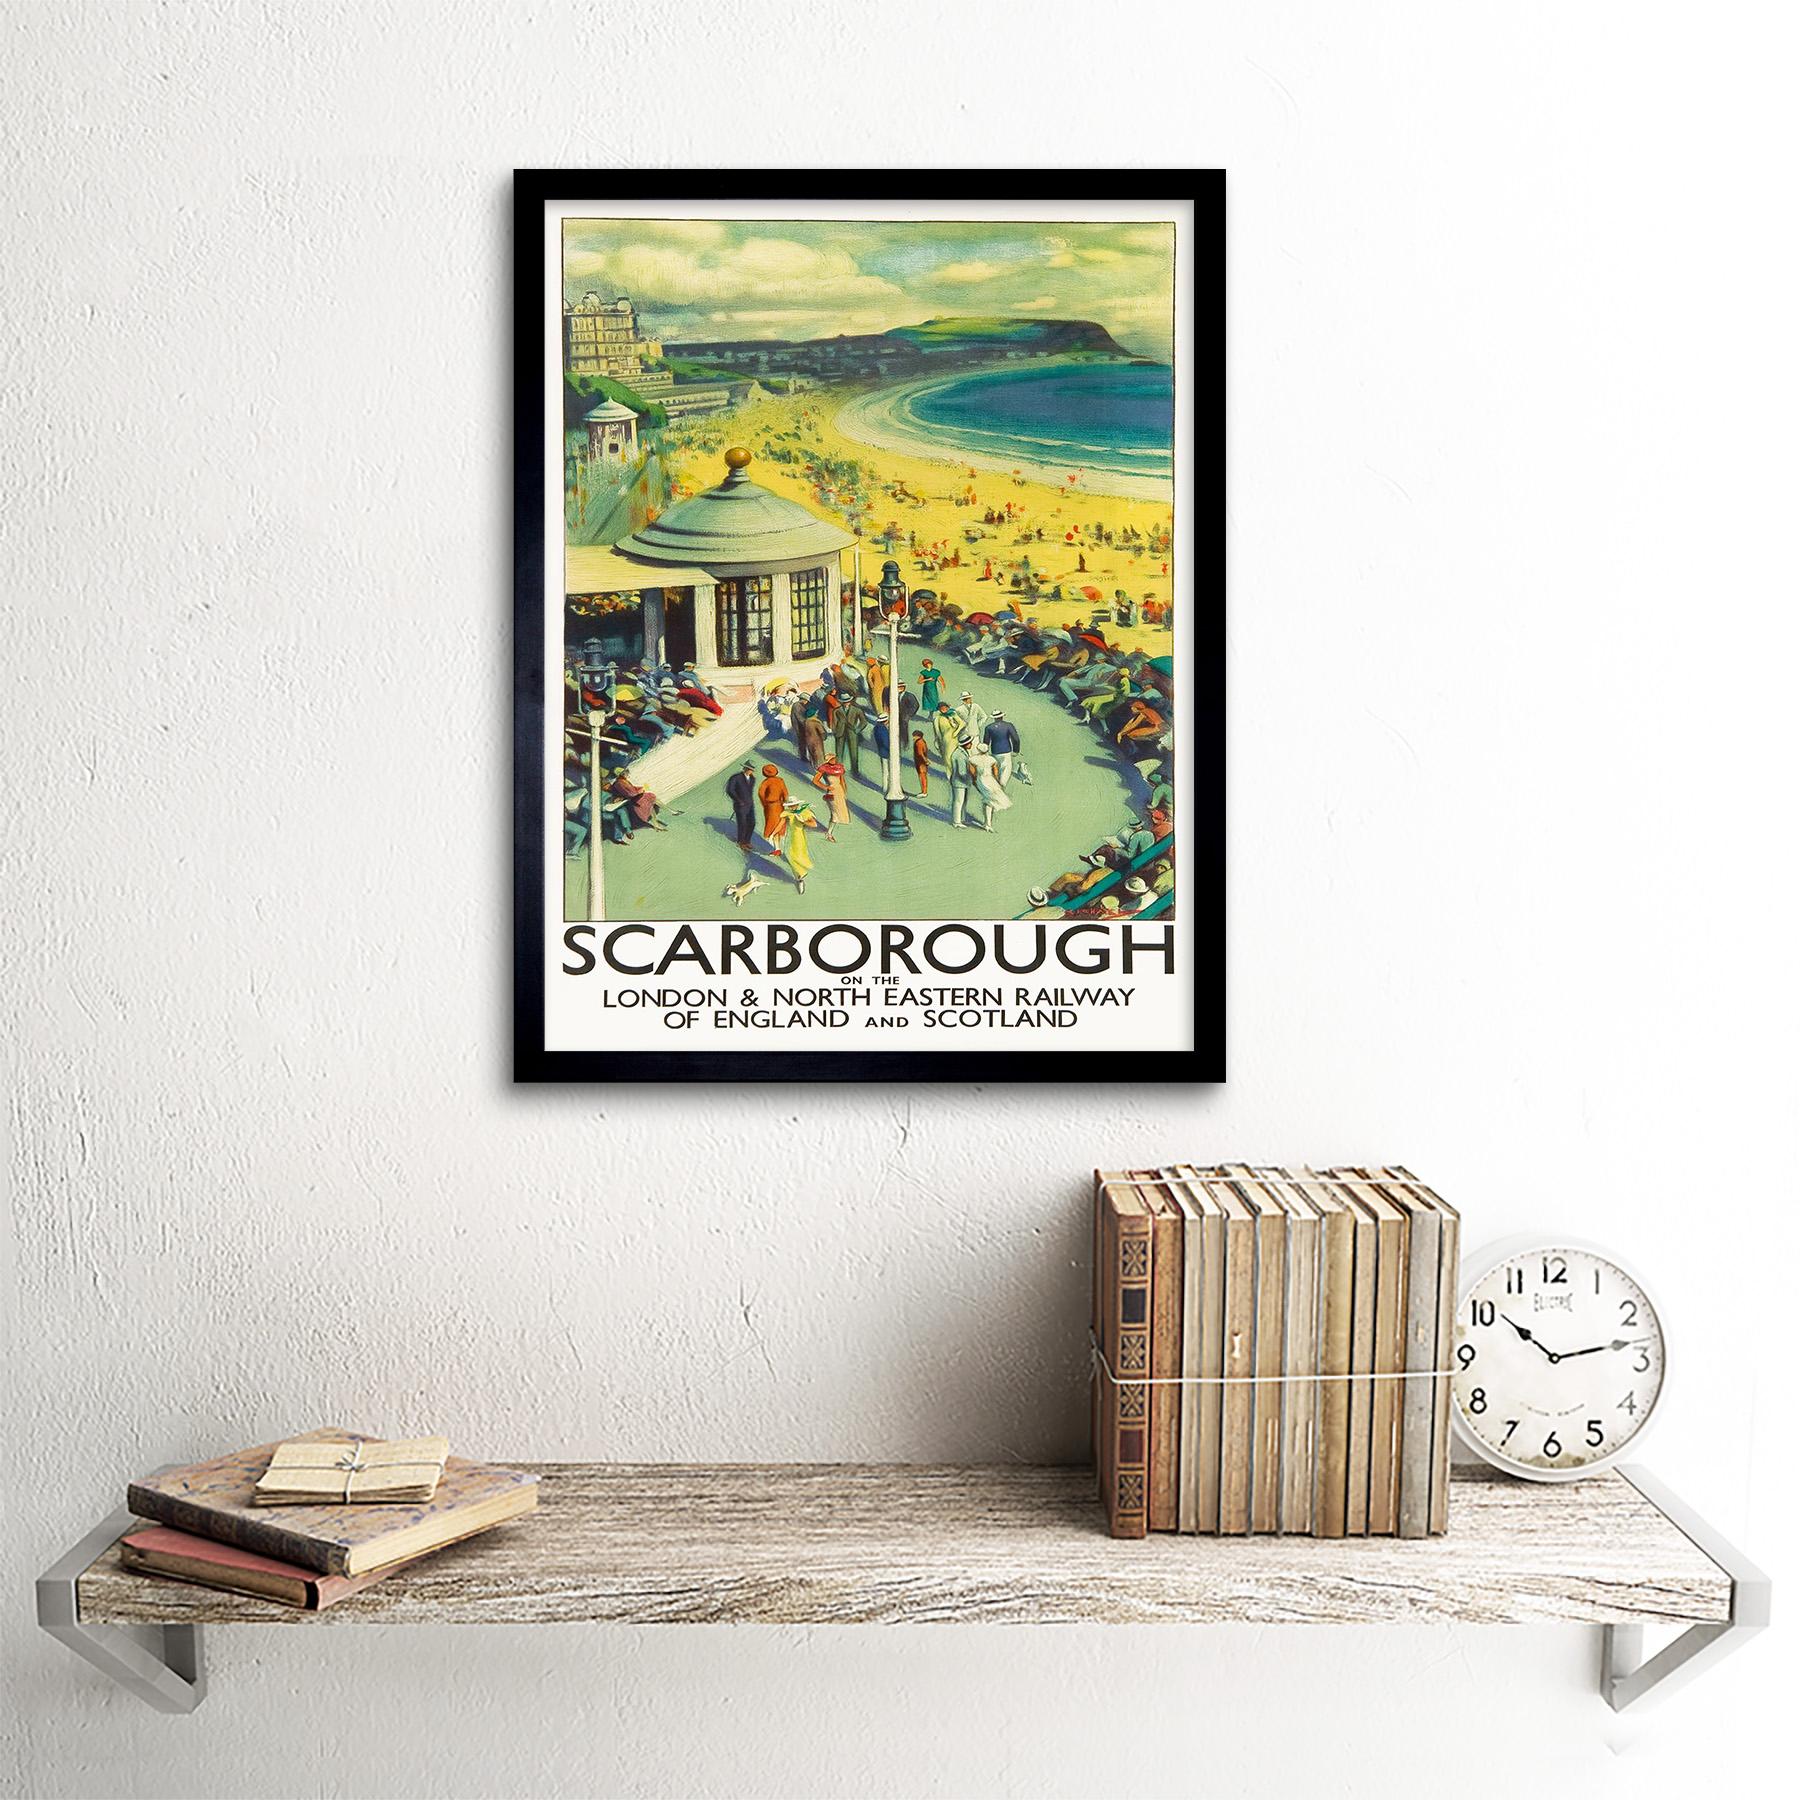 Travel Tourism Scarborough Beach Resort Yorkshire Uk 12X16 Inch Framed Art Print